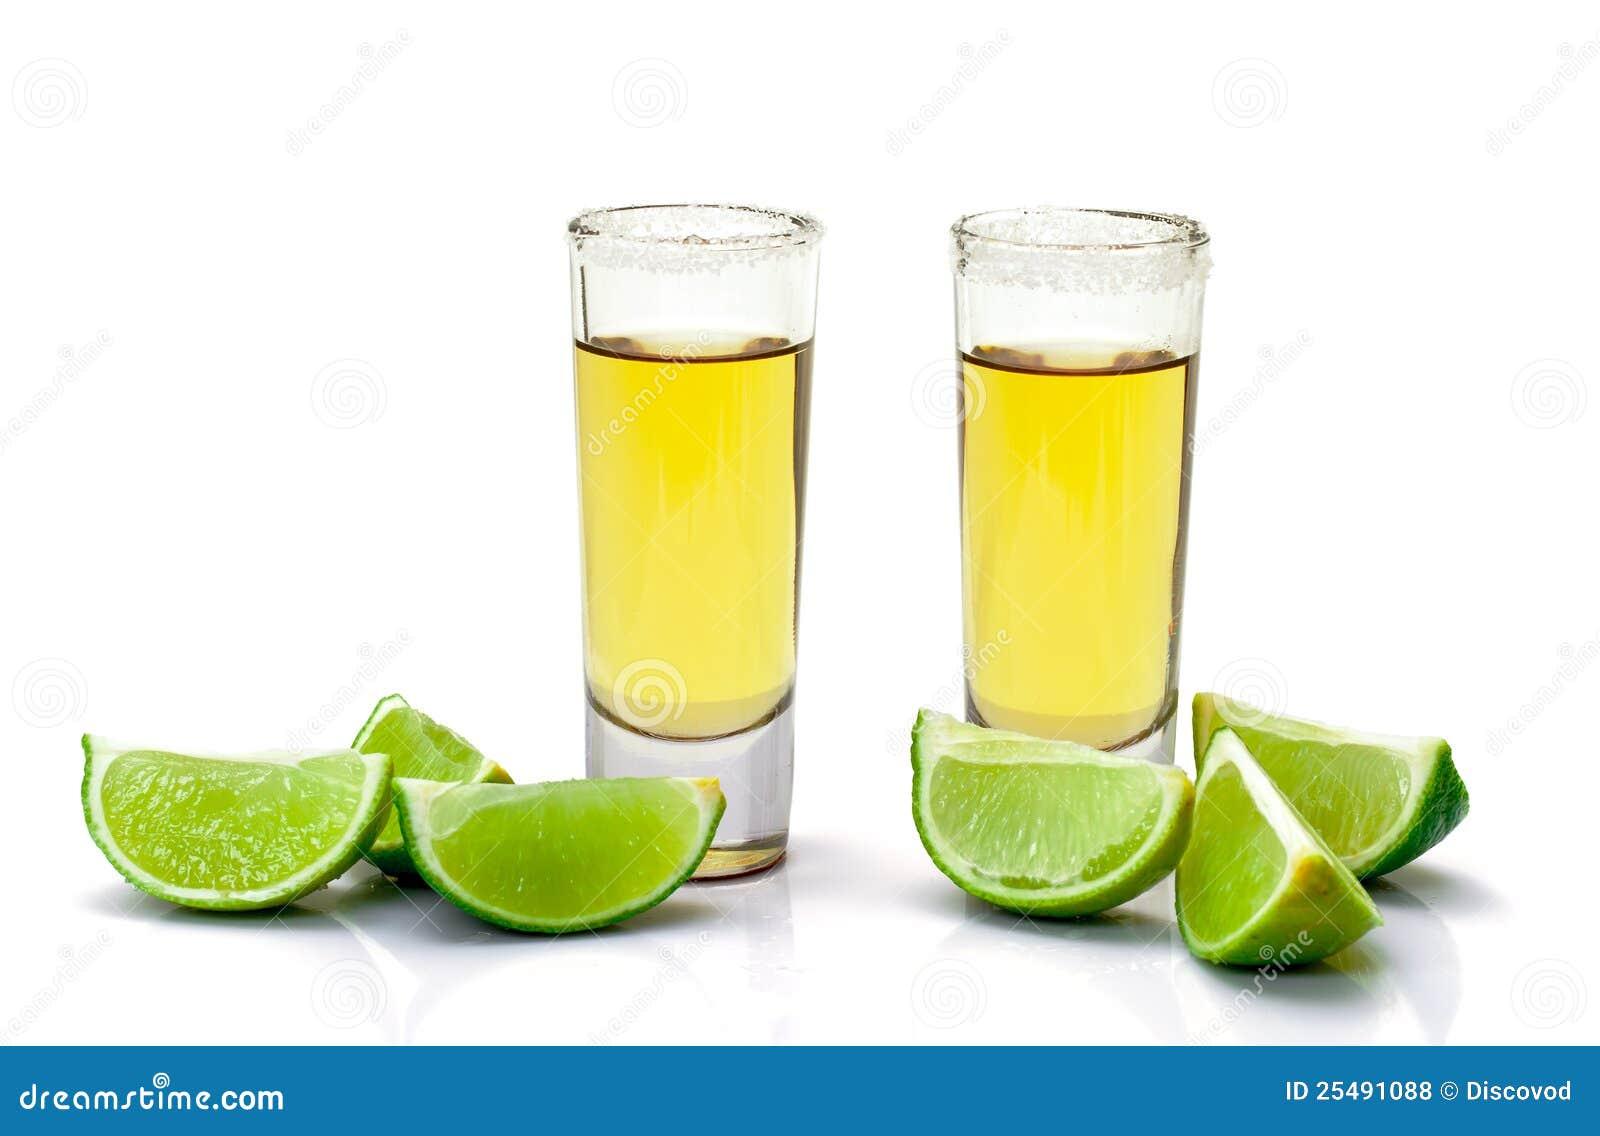 Caballito de tequila no mejor de semen - 2 part 4